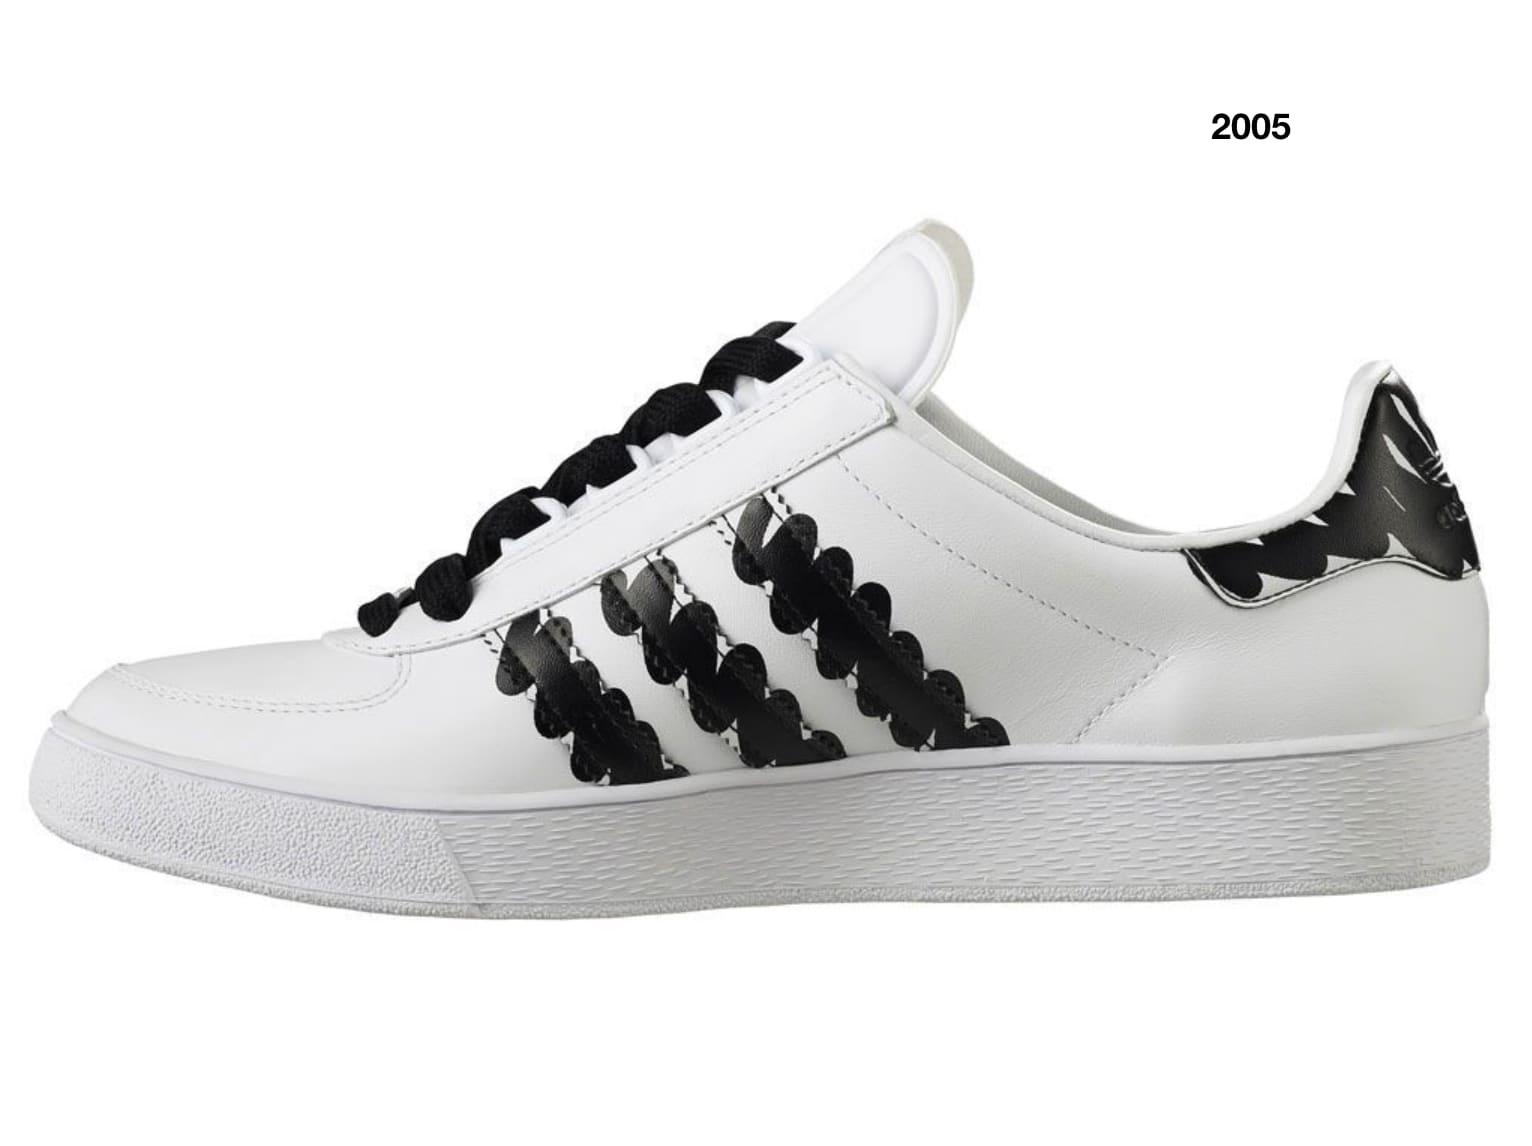 Adidas x Claude Closky x Colette Adicolor Lo BK 1